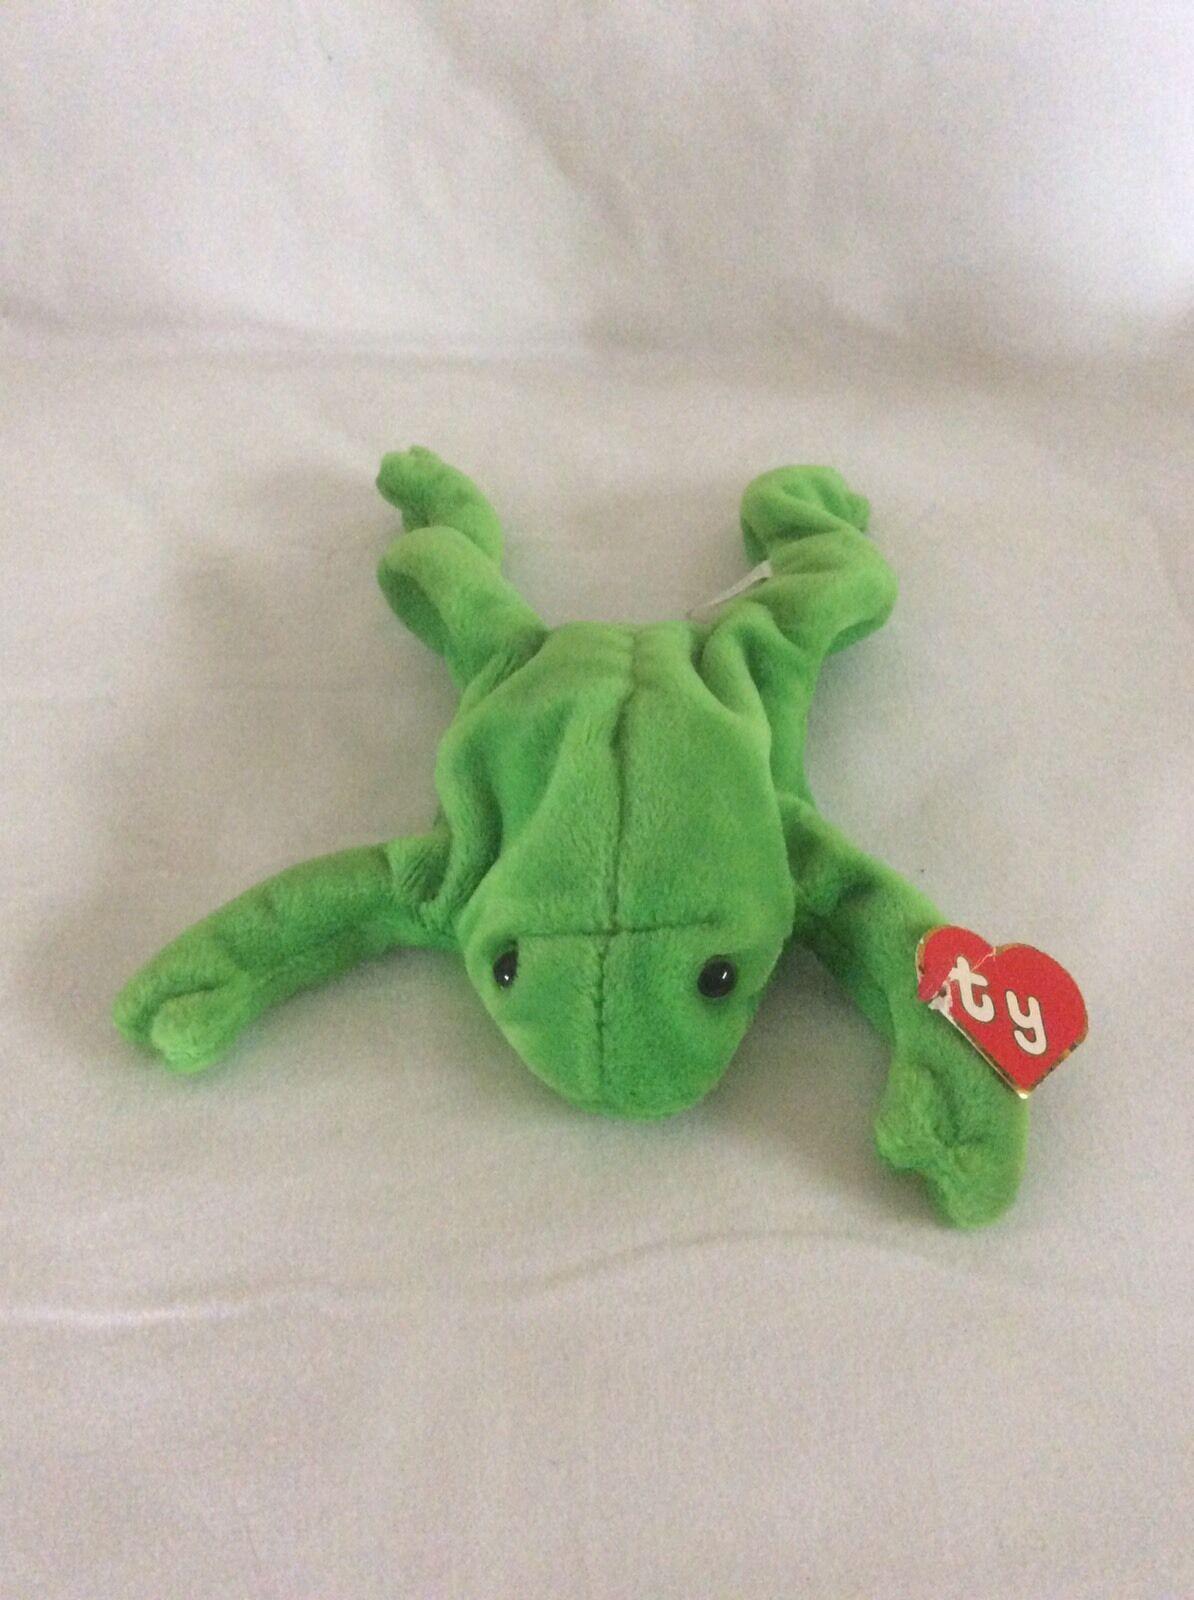 1960b0529b2 Ty LEGS The Frog Made In Korea PVC Plush Stuffed Animal 1993 ...